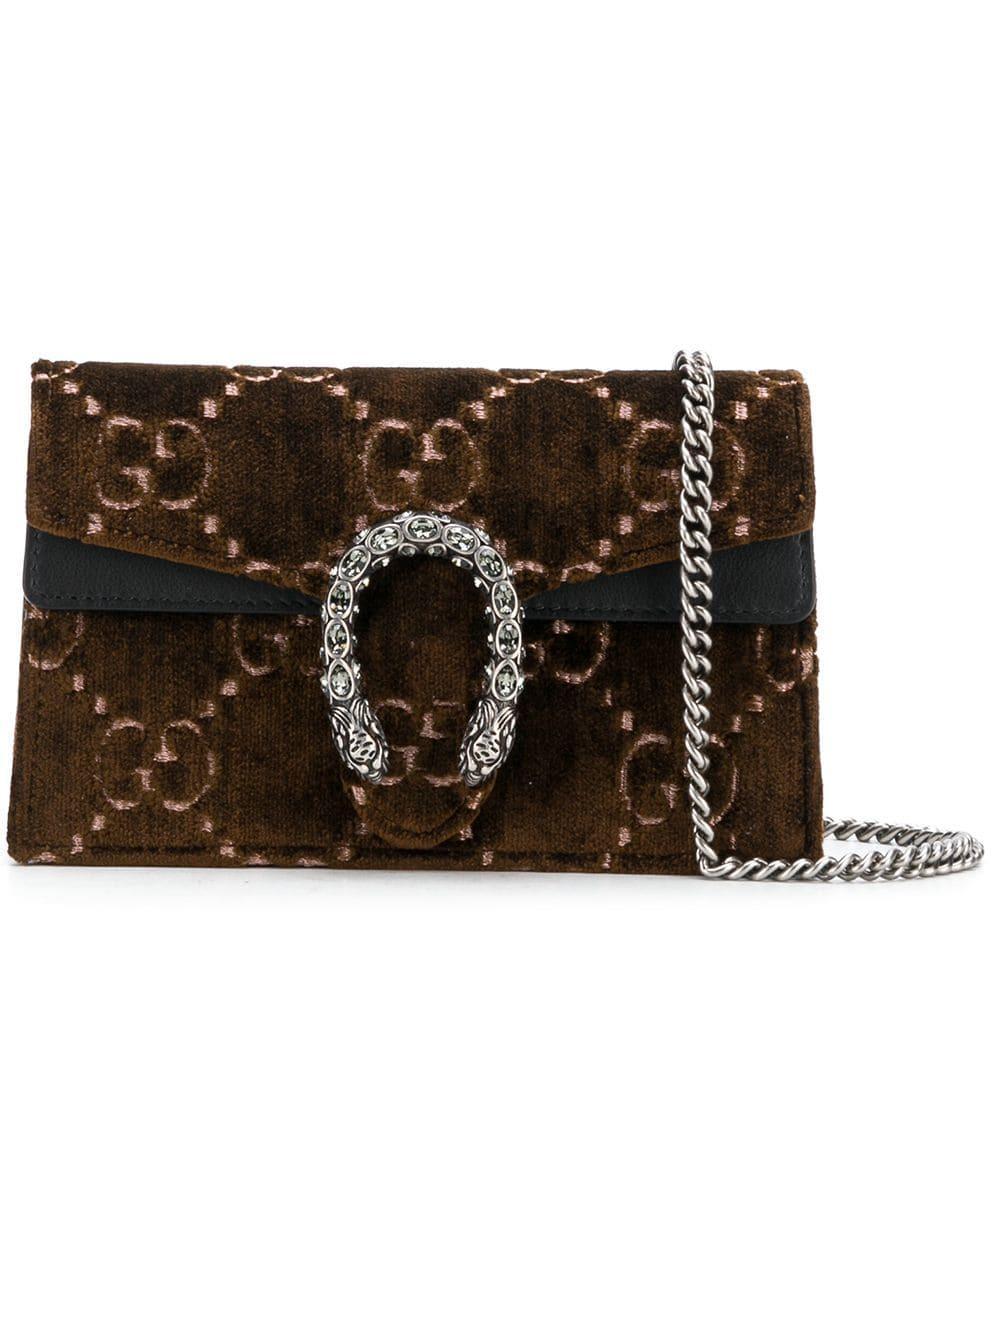 22f93da15ae3 Gucci Dionysus Gg Velvet Small Shoulder Bag In 6484 Red | ModeSens